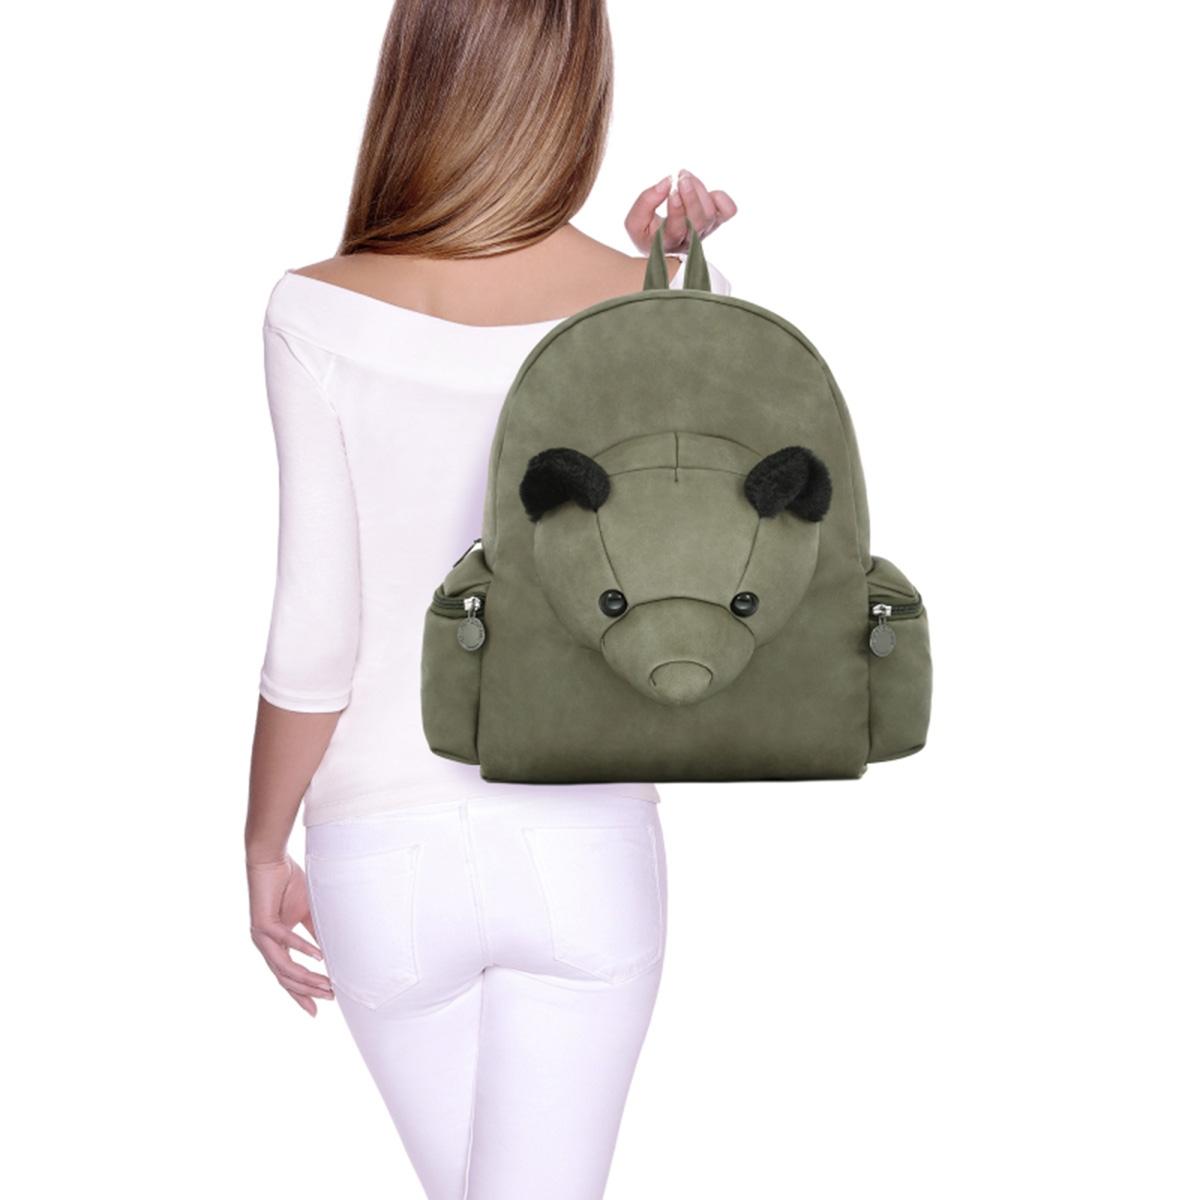 5fea8e98392 Σακίδιο Πλάτης Le Pandorine Bear Backpack Esempio DCG02276 Χακί ...